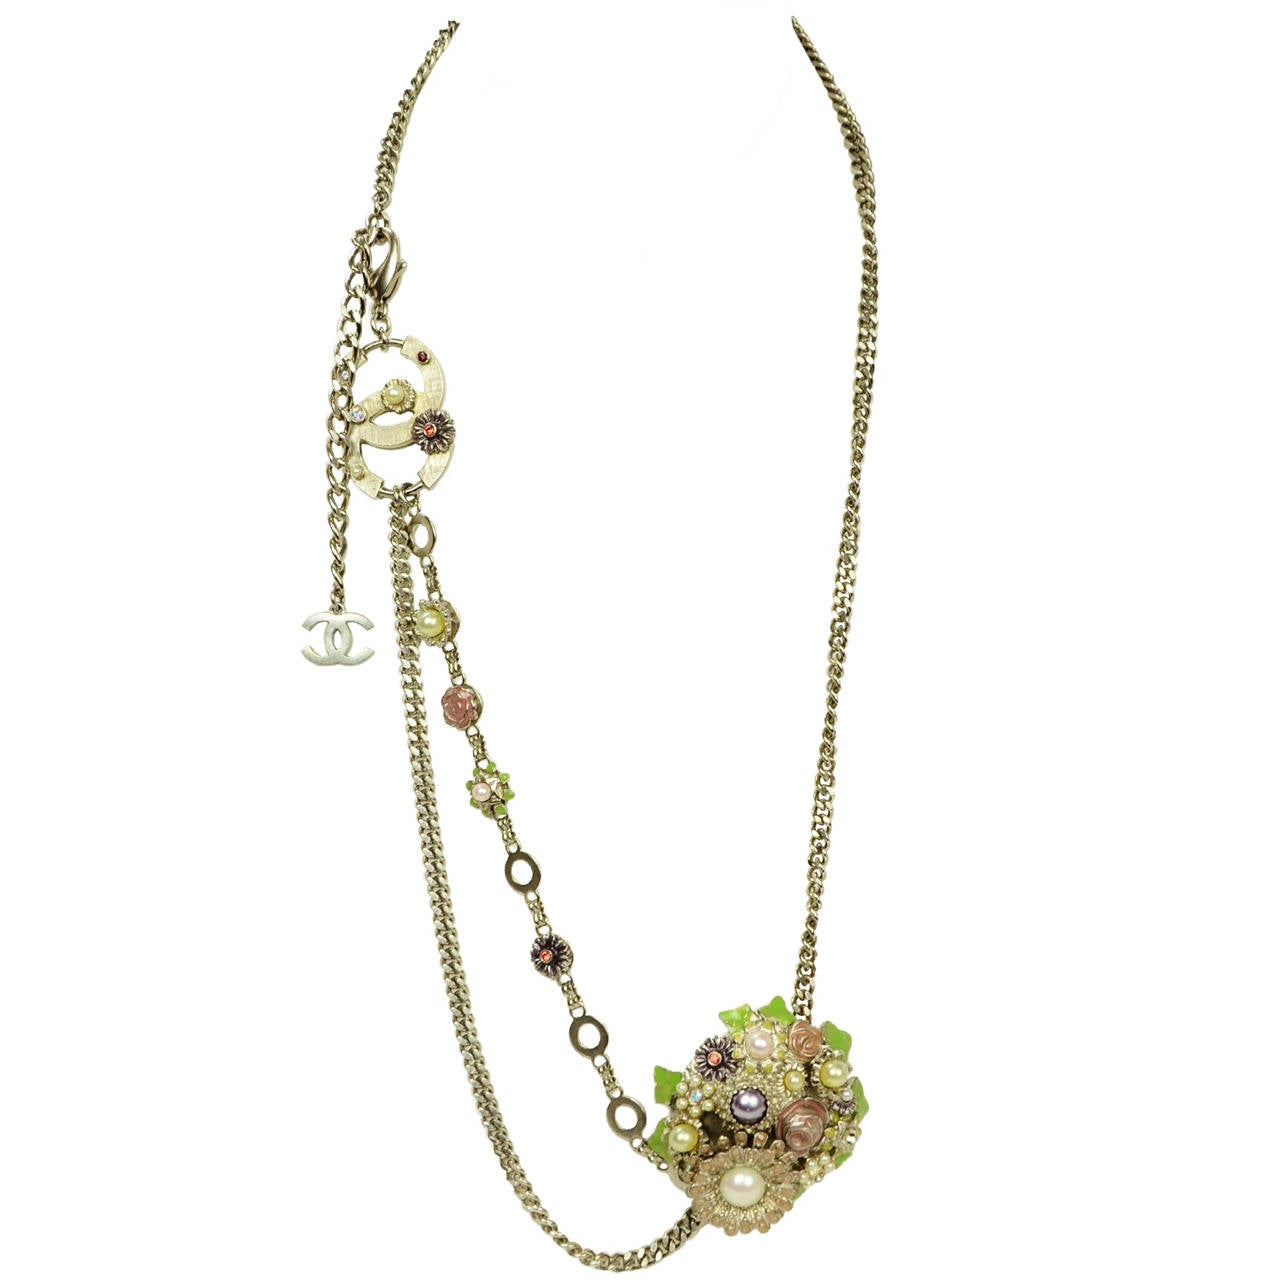 Chanel 2005 Silver Chain Link Belt/Necklace w/Flower & CC Pendants 1